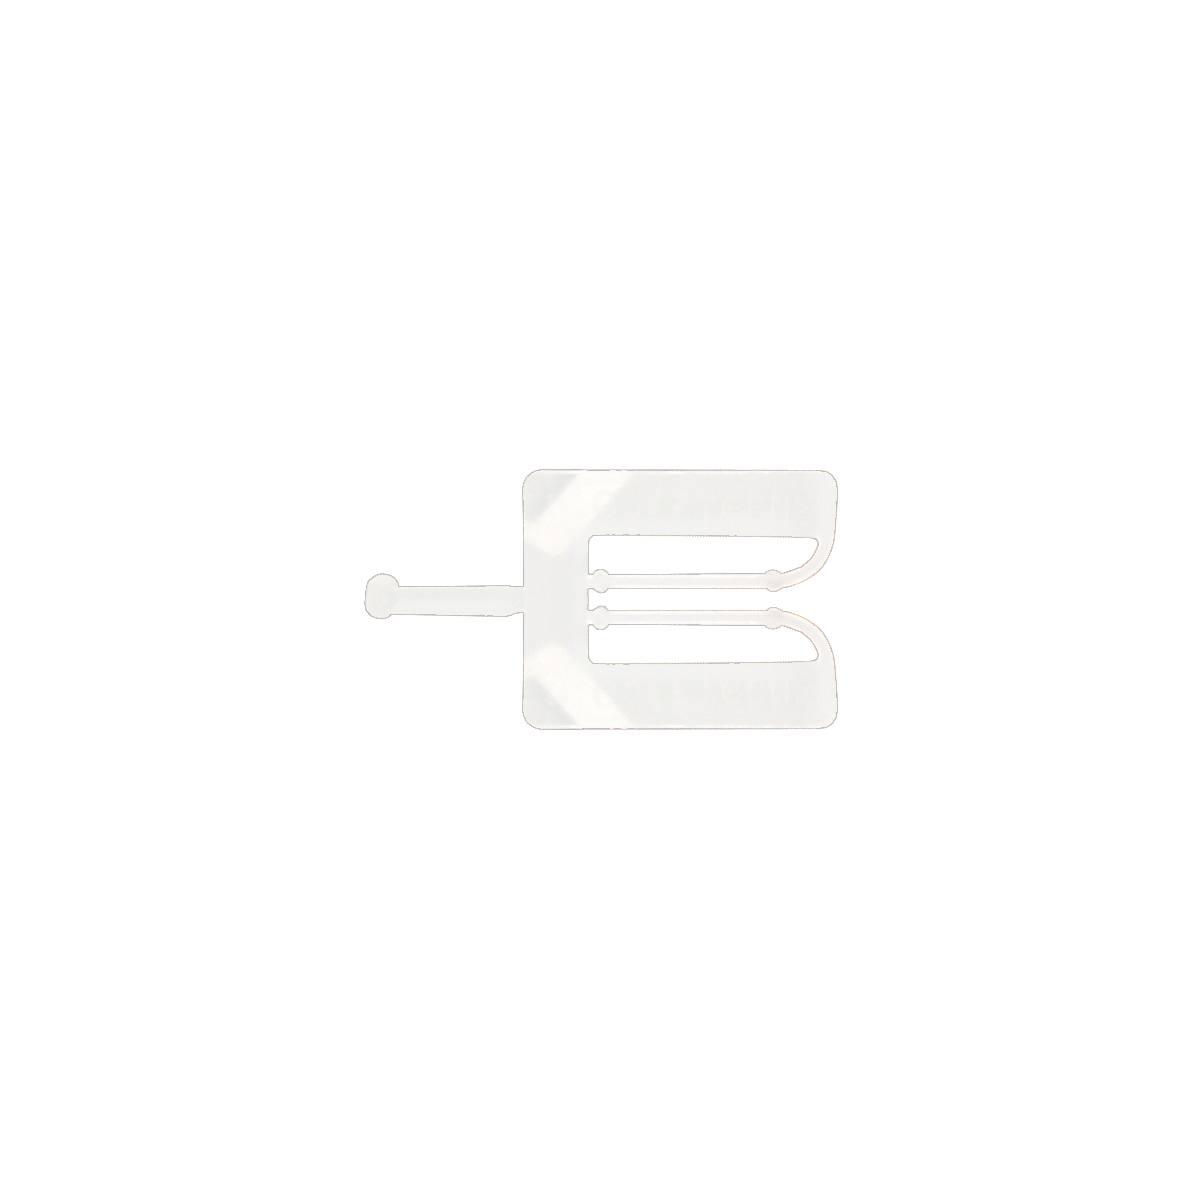 SACHET 1000 CALES KLIC-CLAC 3 MM